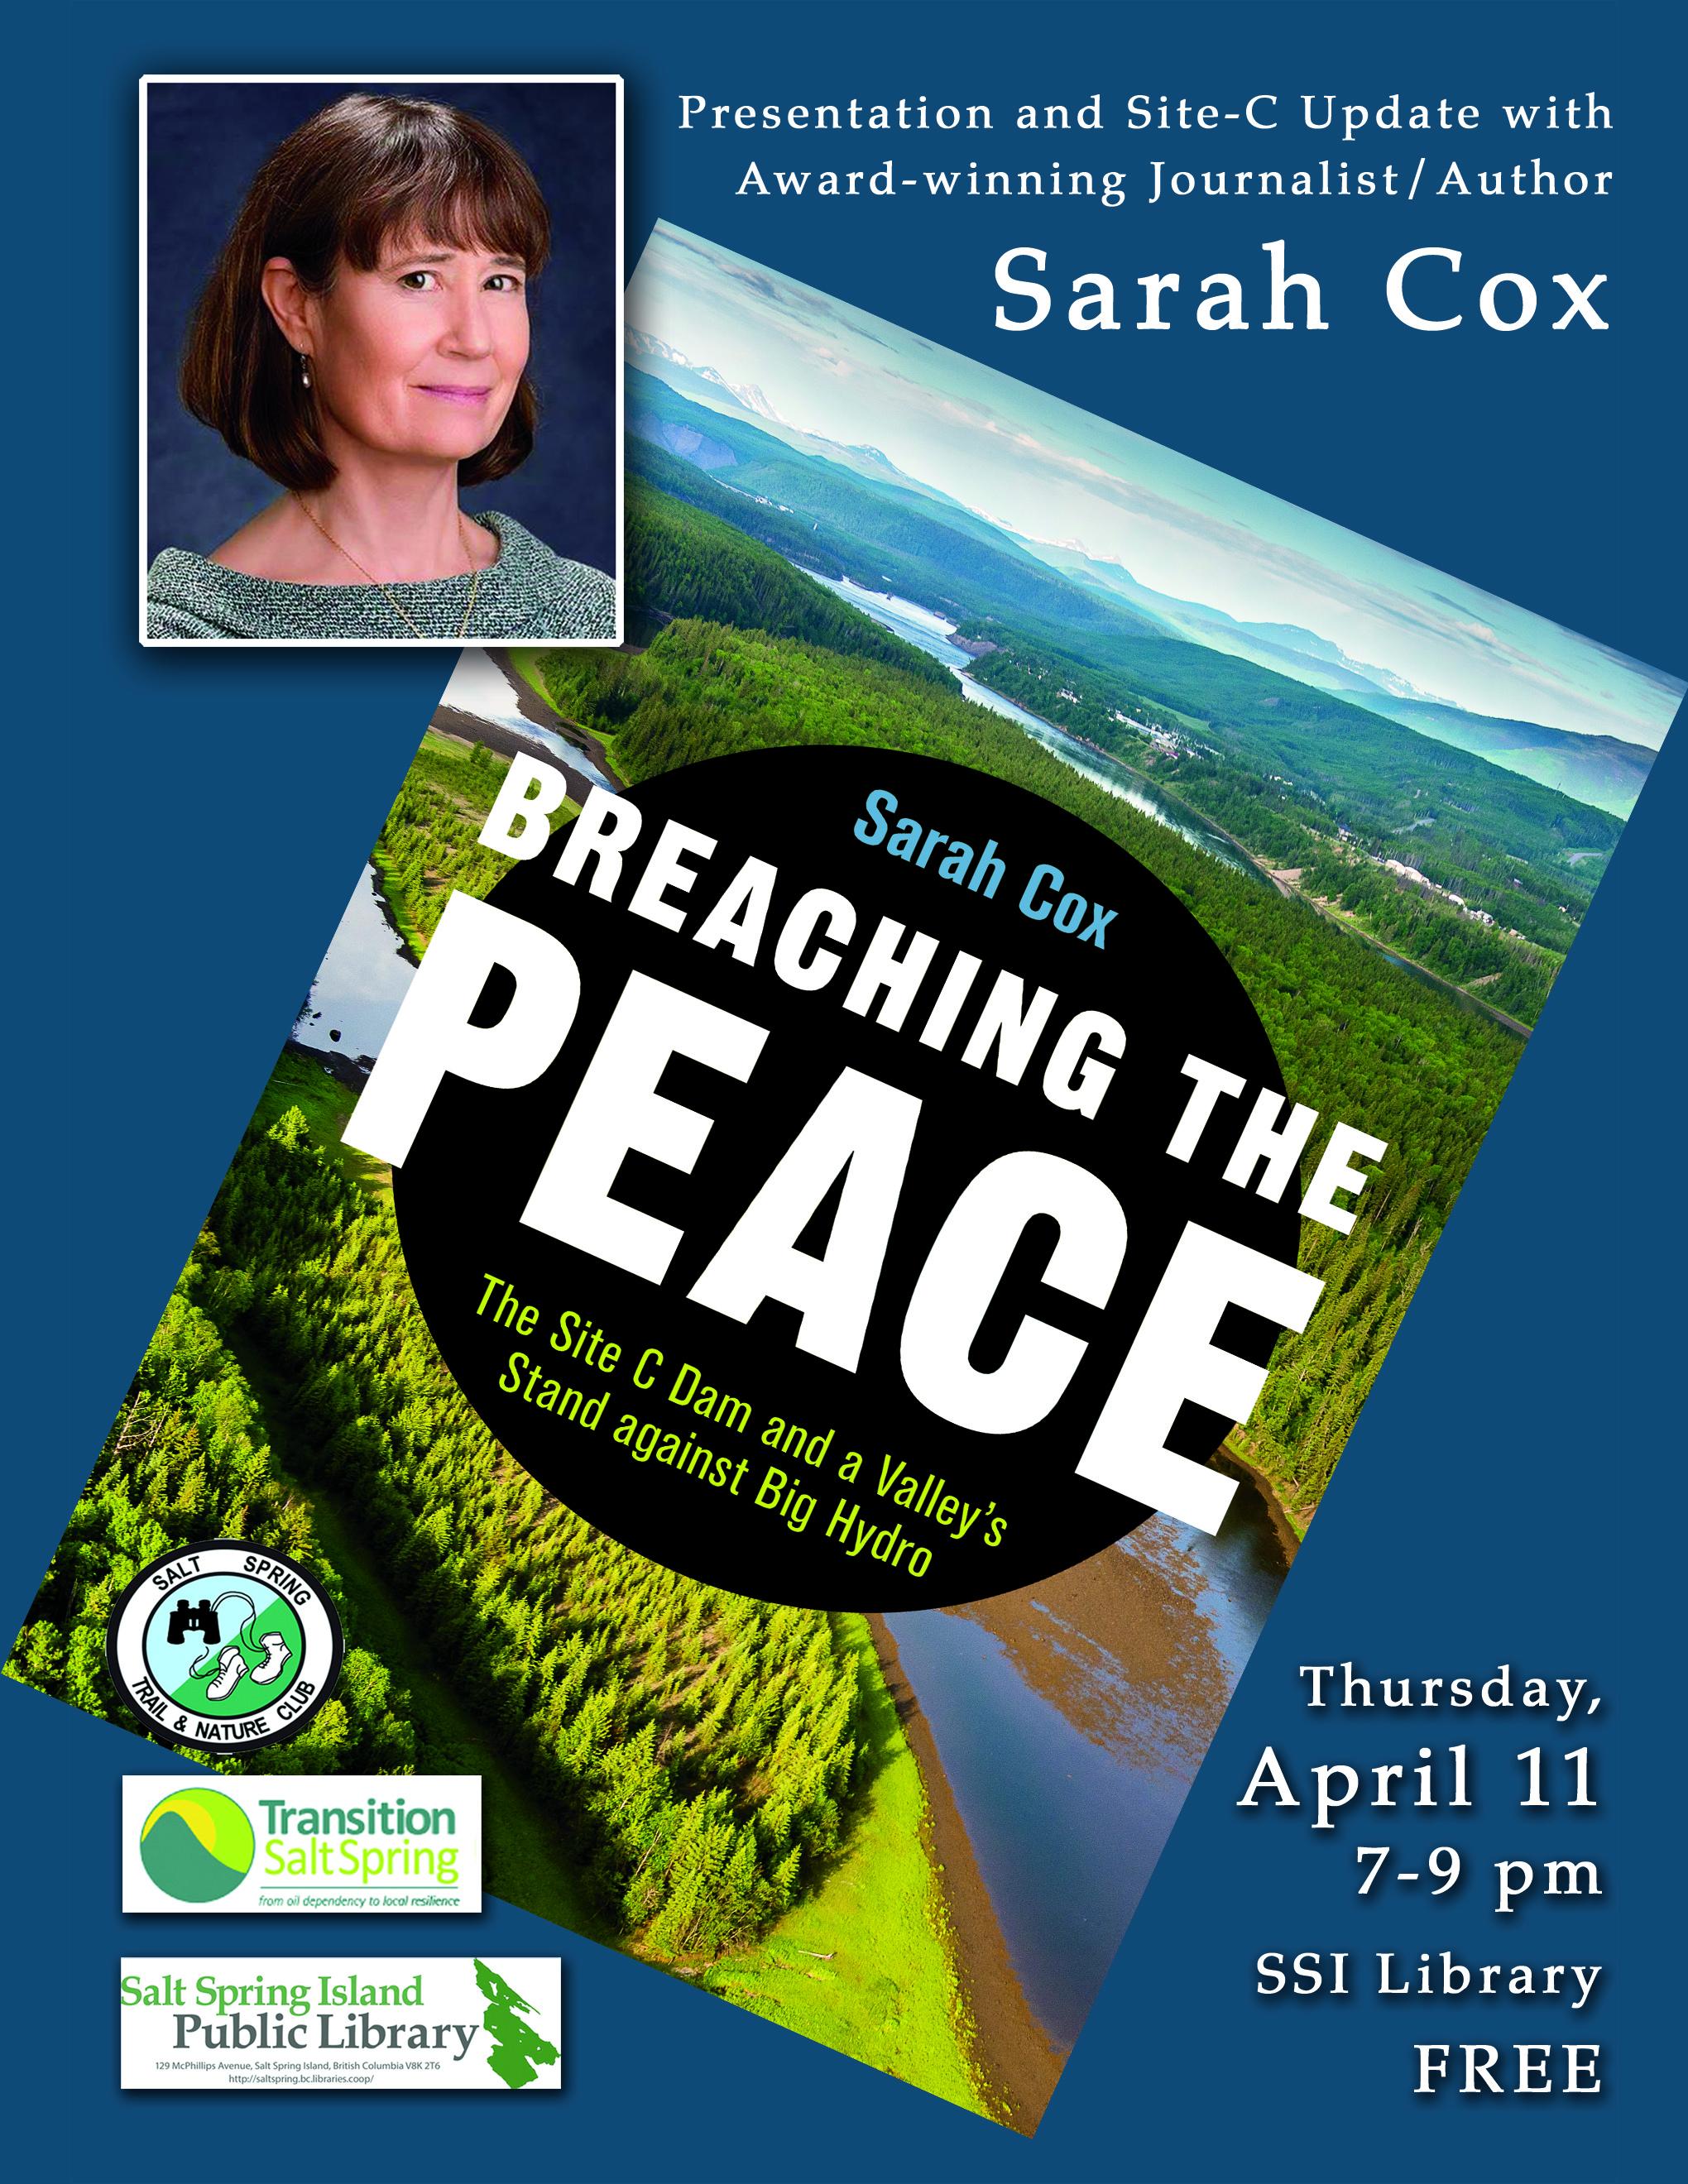 Sarah Cox @ Community Program Room